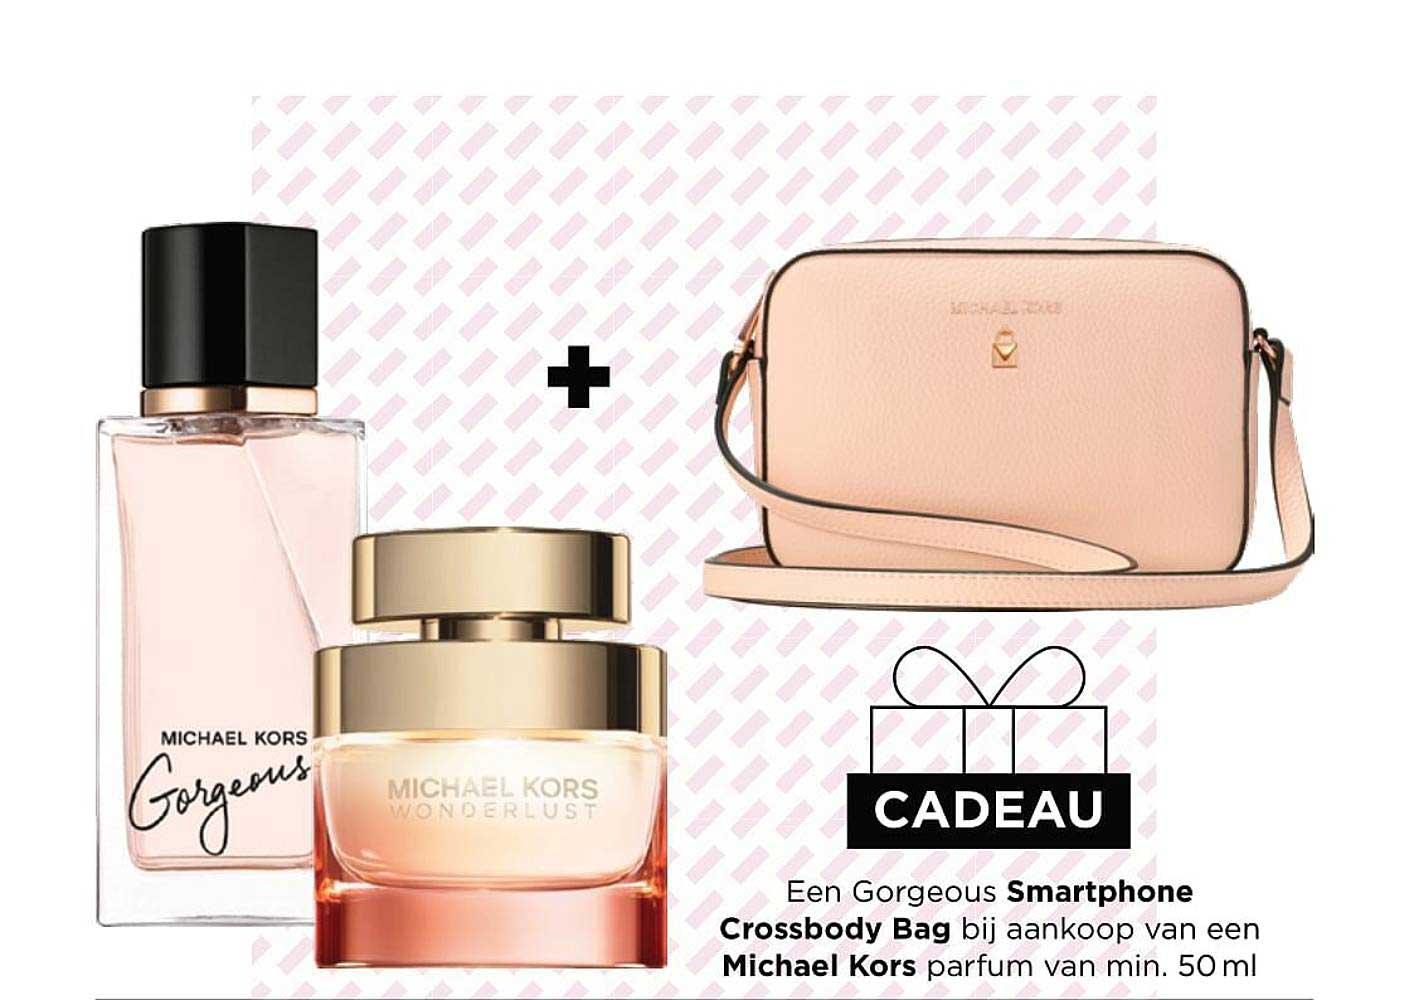 ICI PARIS XL Smartphone Crossbody Bag Michael Kors Parfum